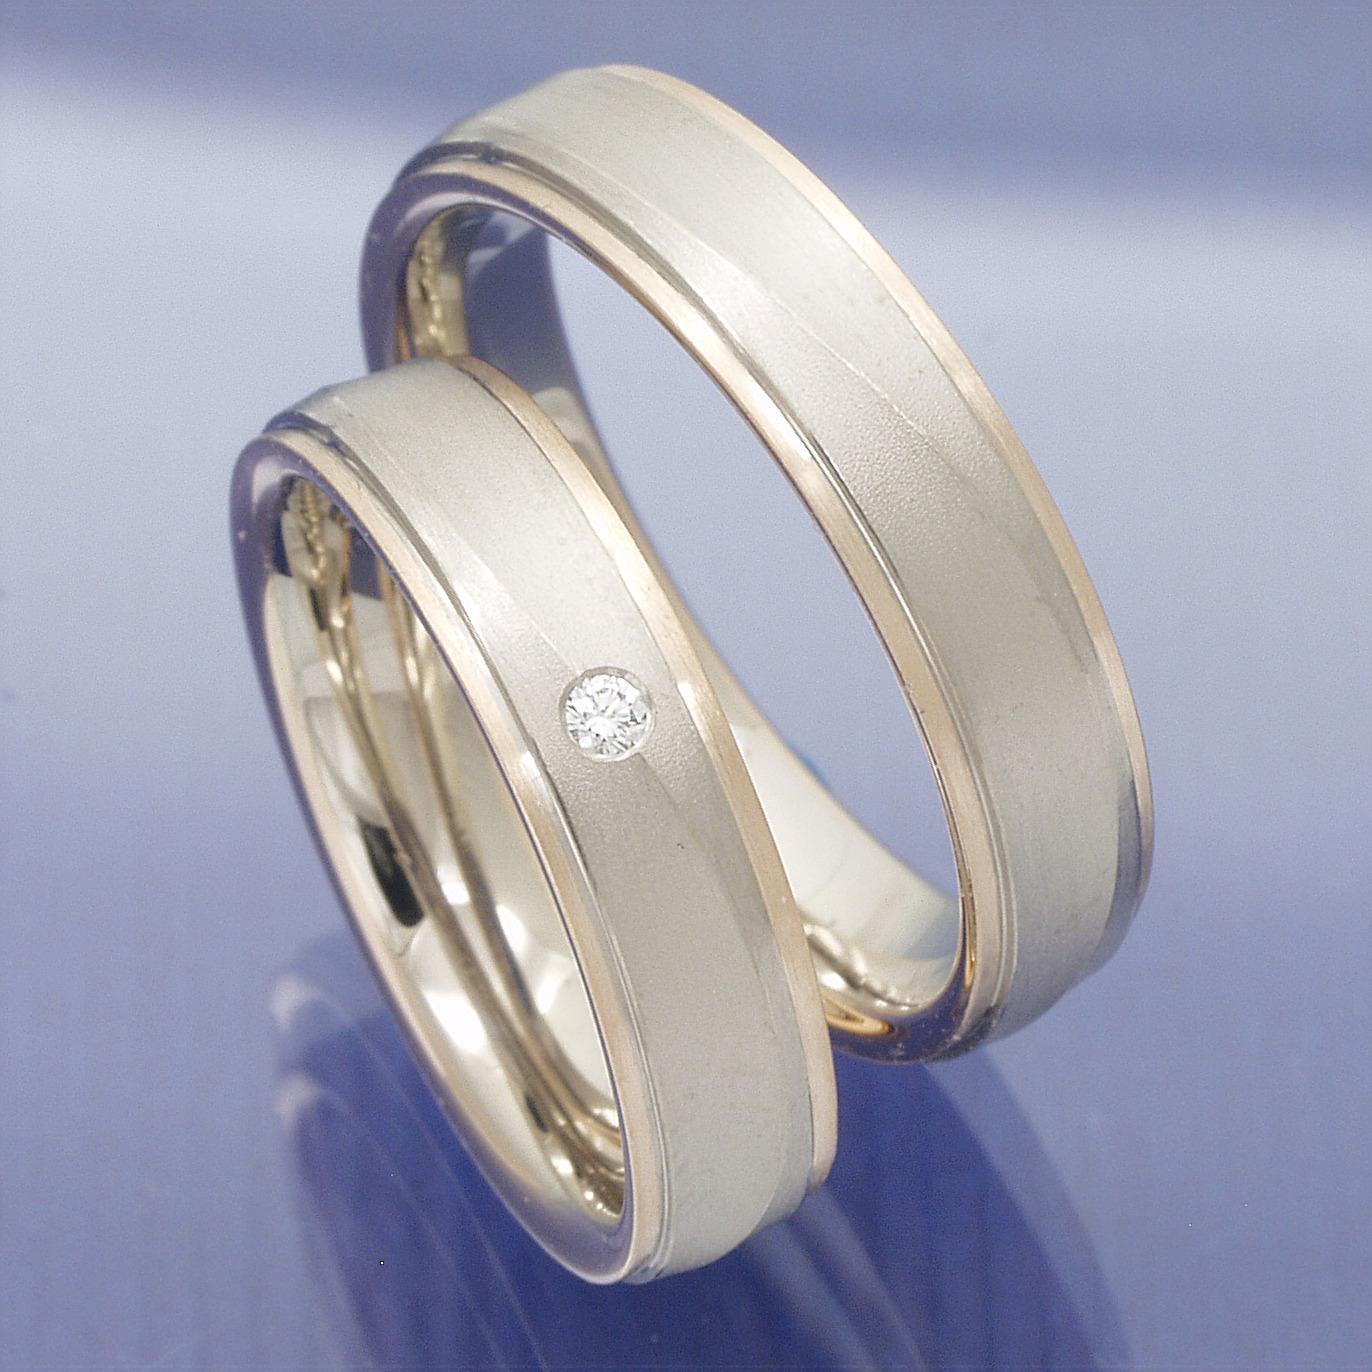 Partnerringe weißgold  Eheringe-Shop - 1 Paar Eheringe oder auch Partnerringe aus 585 ...